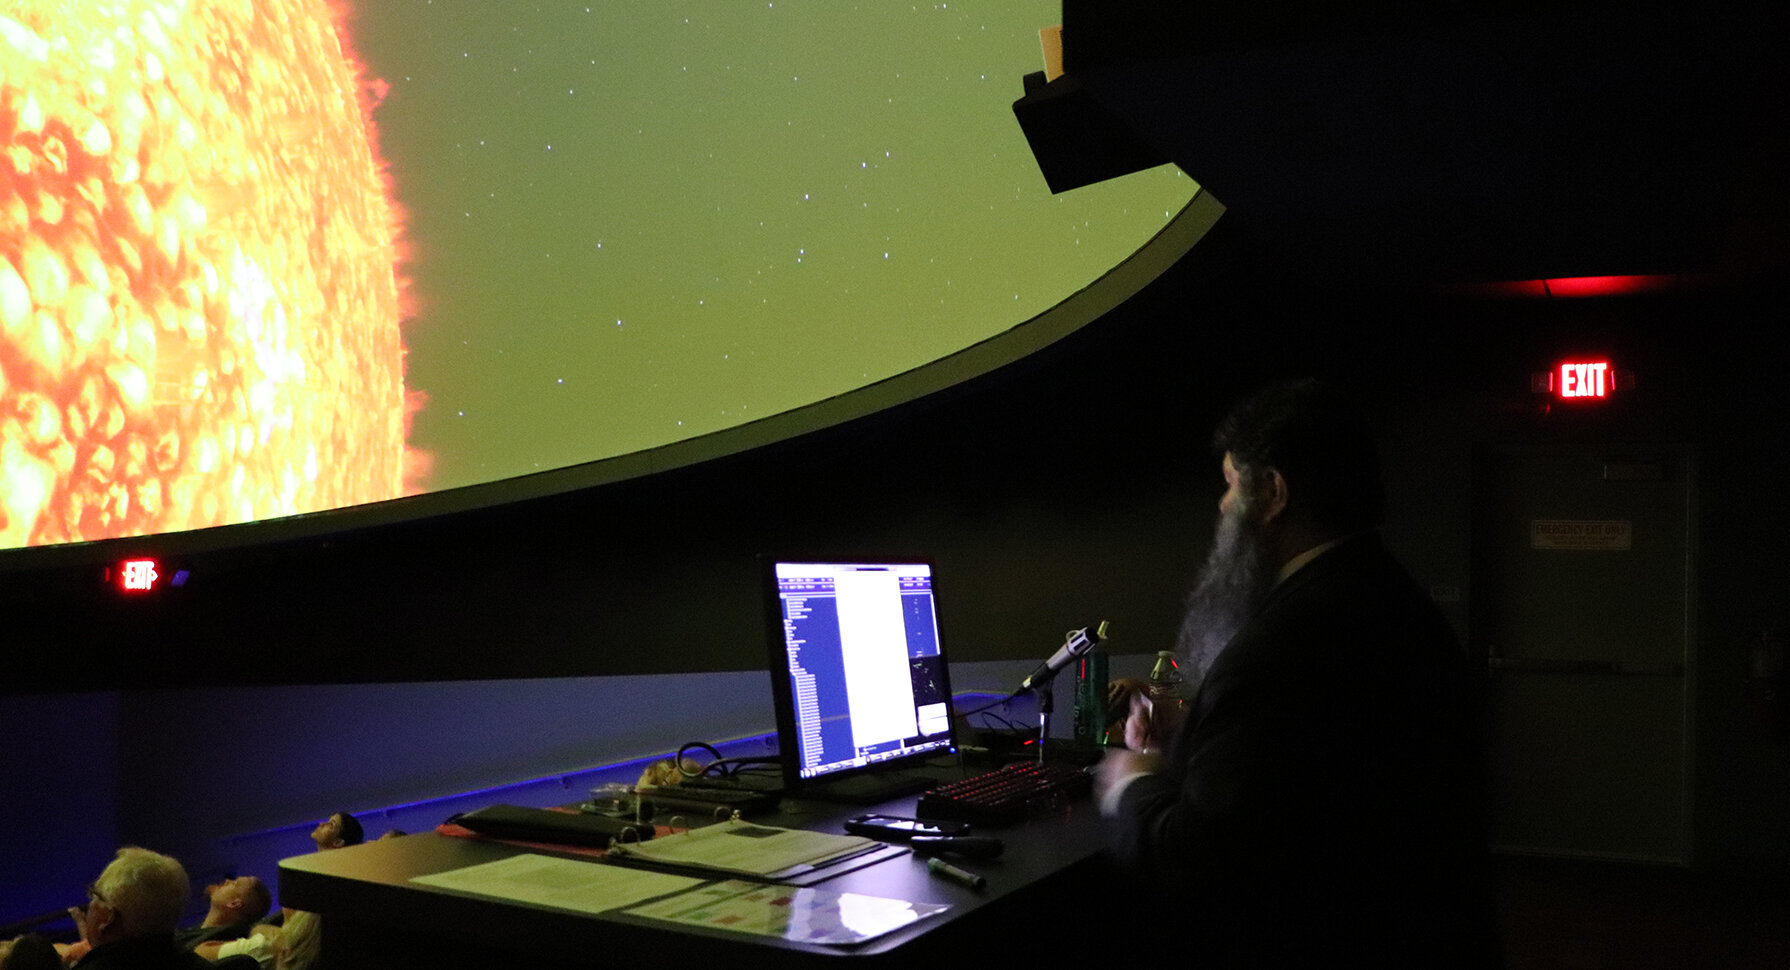 UoL-ILN-TheWorks-AstronoME-2.jpg